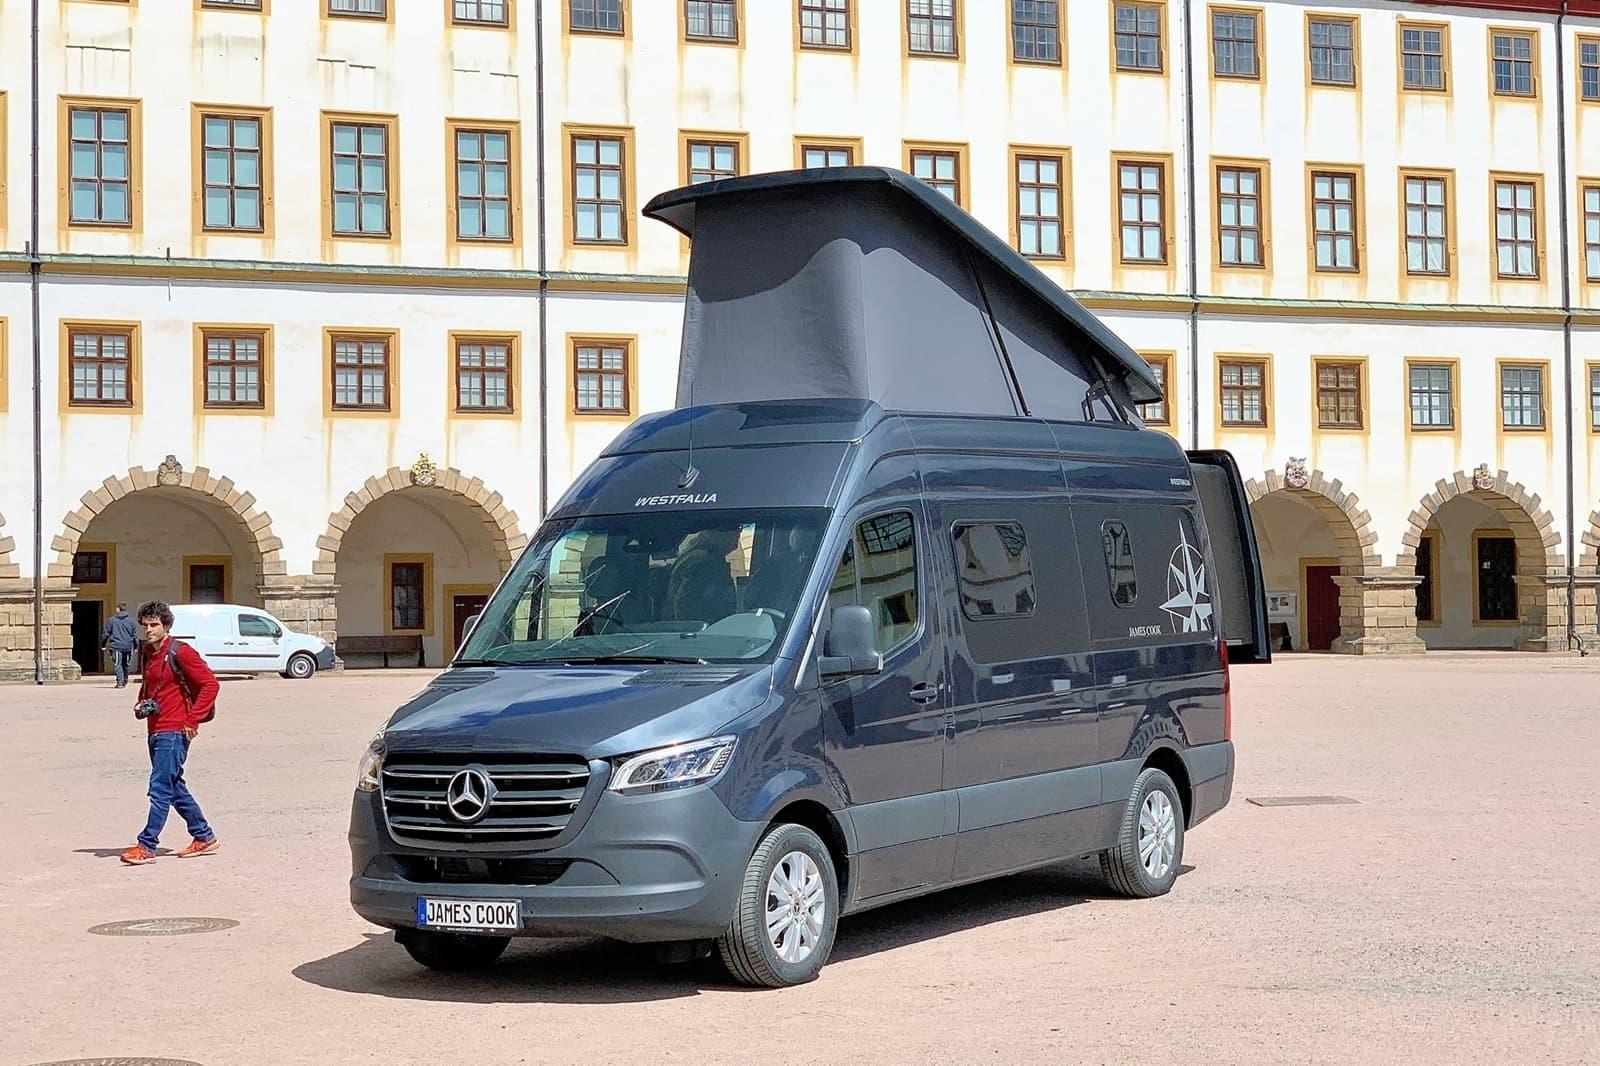 Mercedes Sprinter James Cook 2019 0619 001